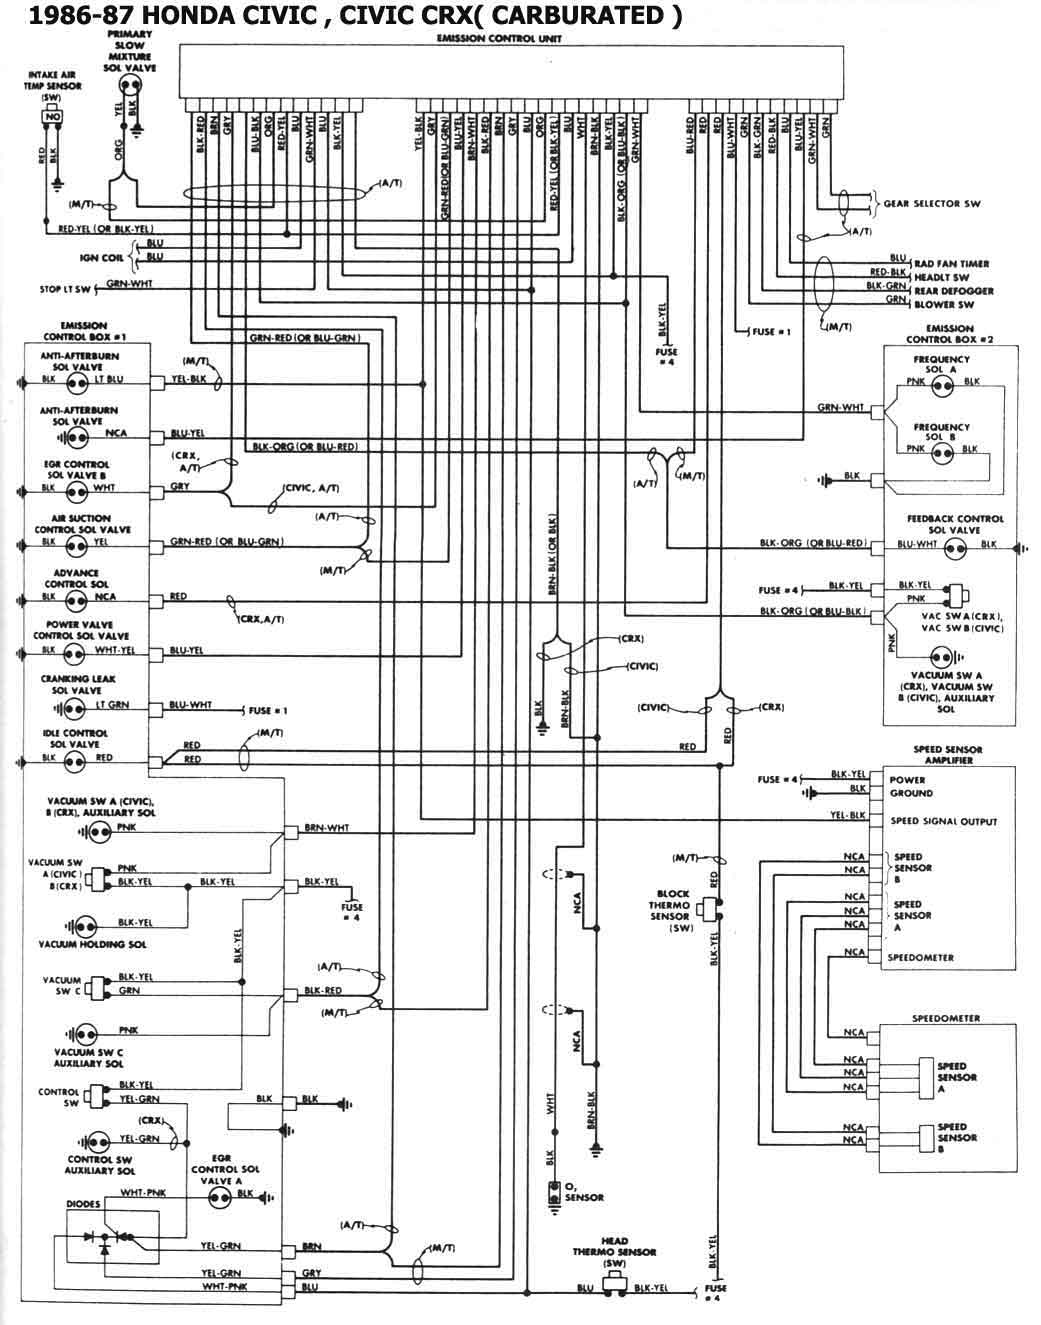 87 Crx Wiring Diagram 87 Crx Wiring Diagram Free Picture Wiring